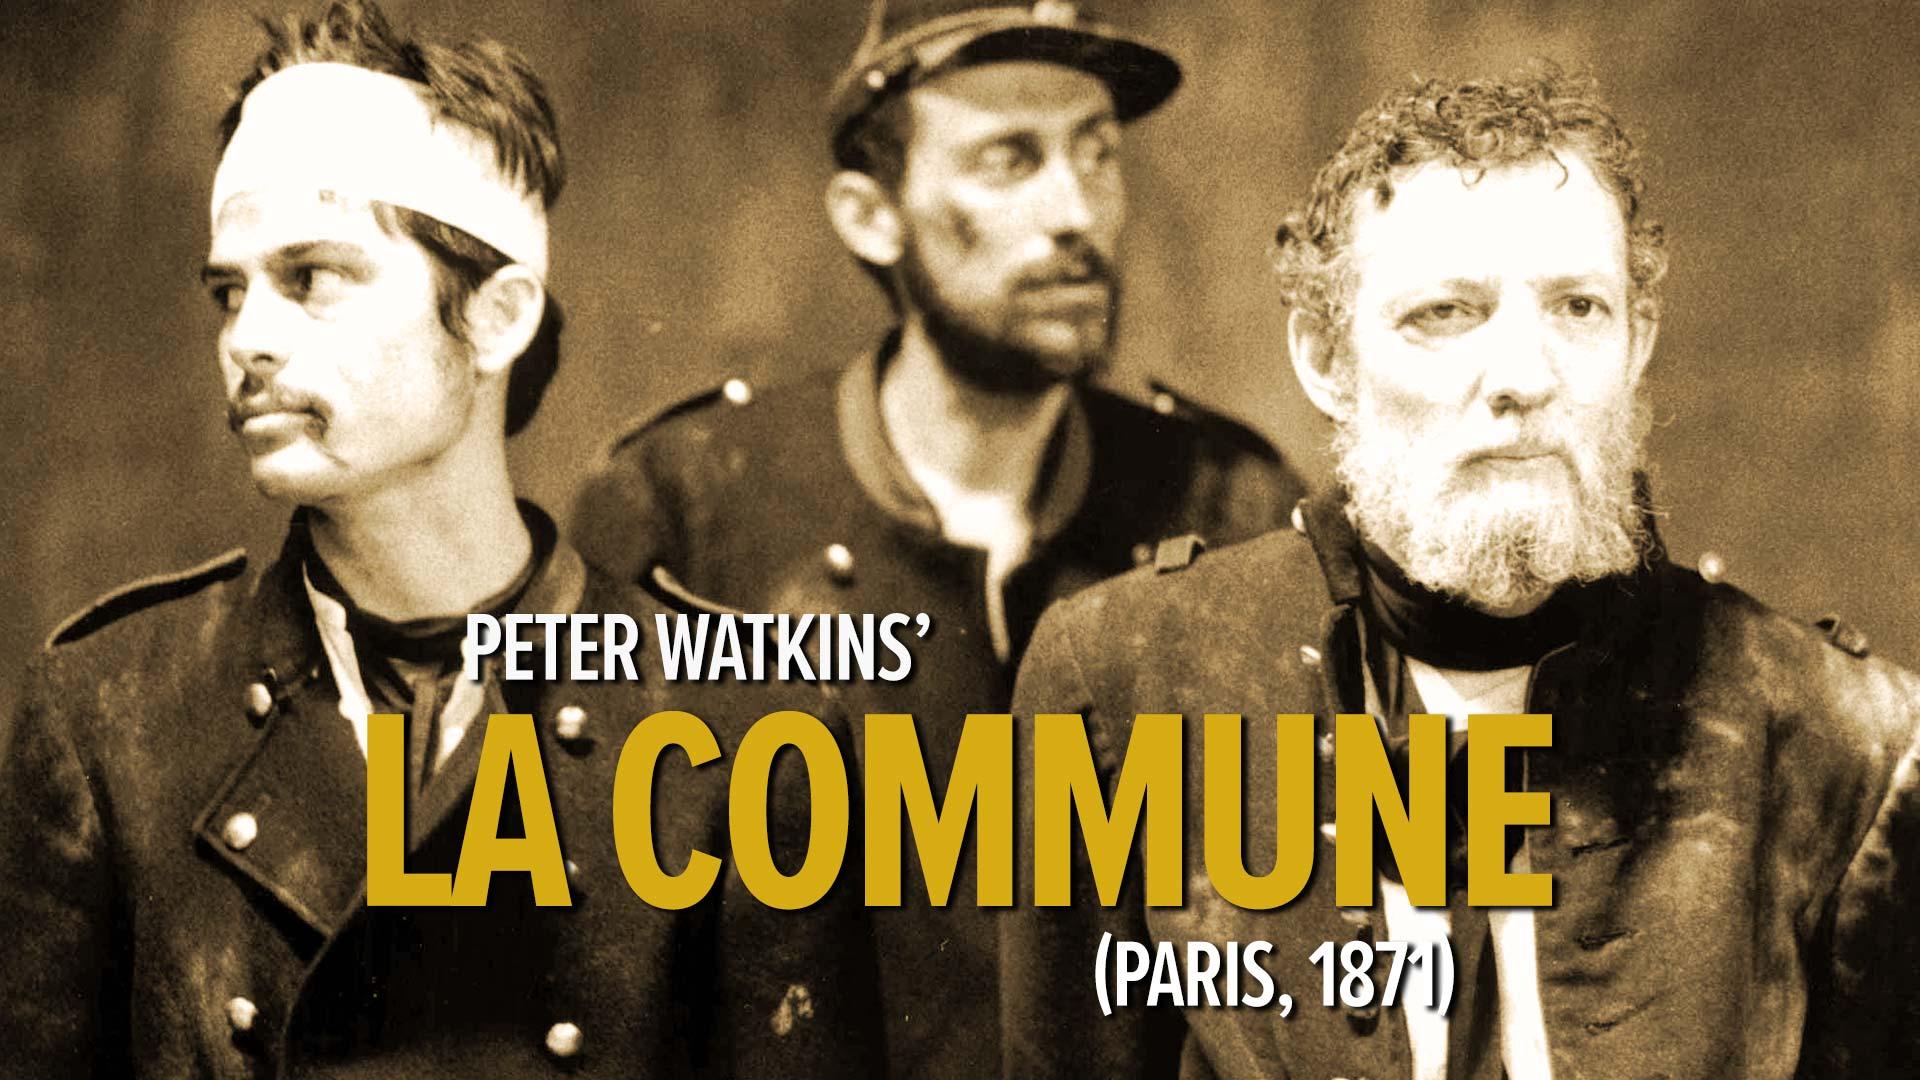 La Commune (Paris 1871) (Theatrical Version) - image